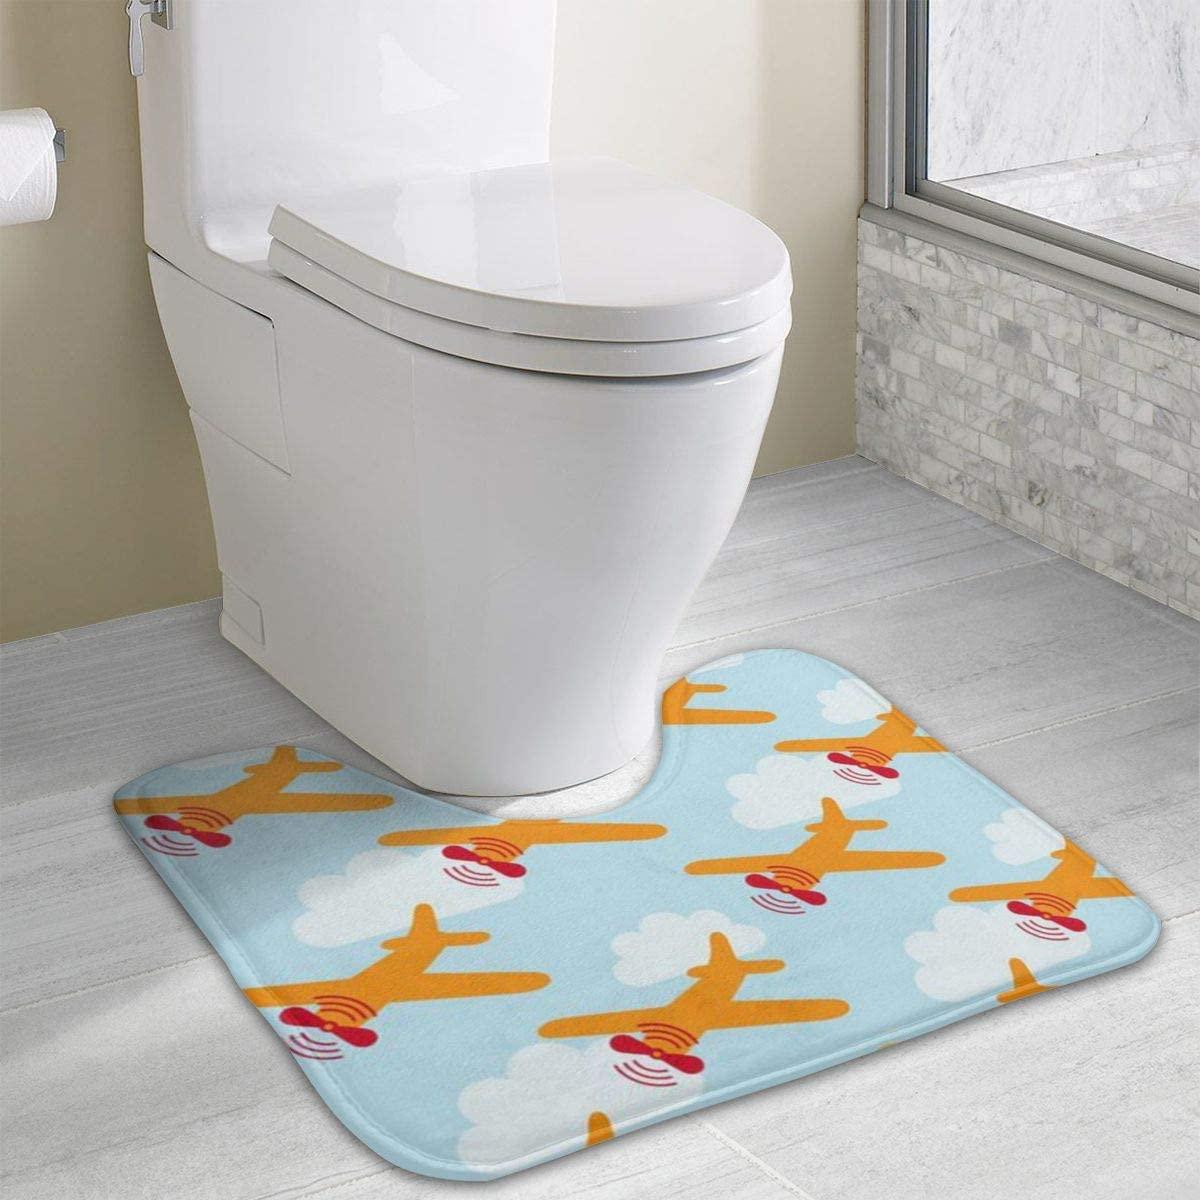 Bathroom Rug, Orange Rotary Plane U-Shaped Non Slip Absorbent Toilet Bath Floor Contour Doormat Shower Mat Carpet 19.3 X 15.7 Inch